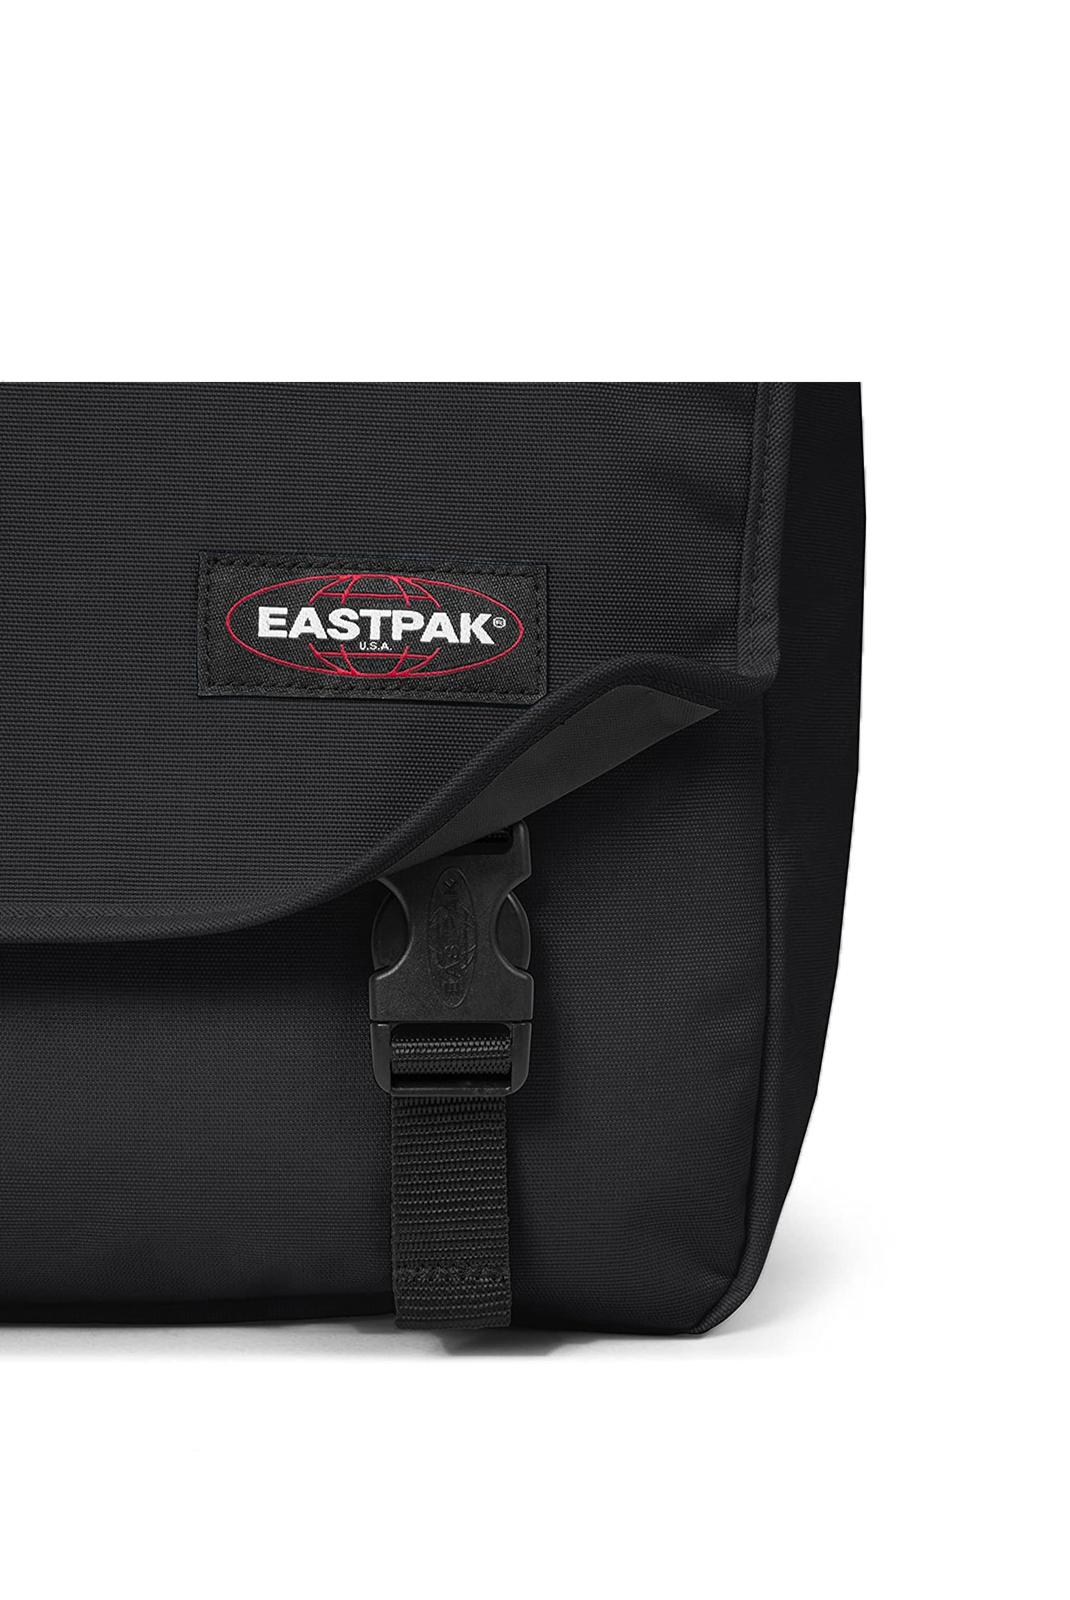 Sac porté épaule  Eastpak EK076008 DELEGATE 008 NOIR